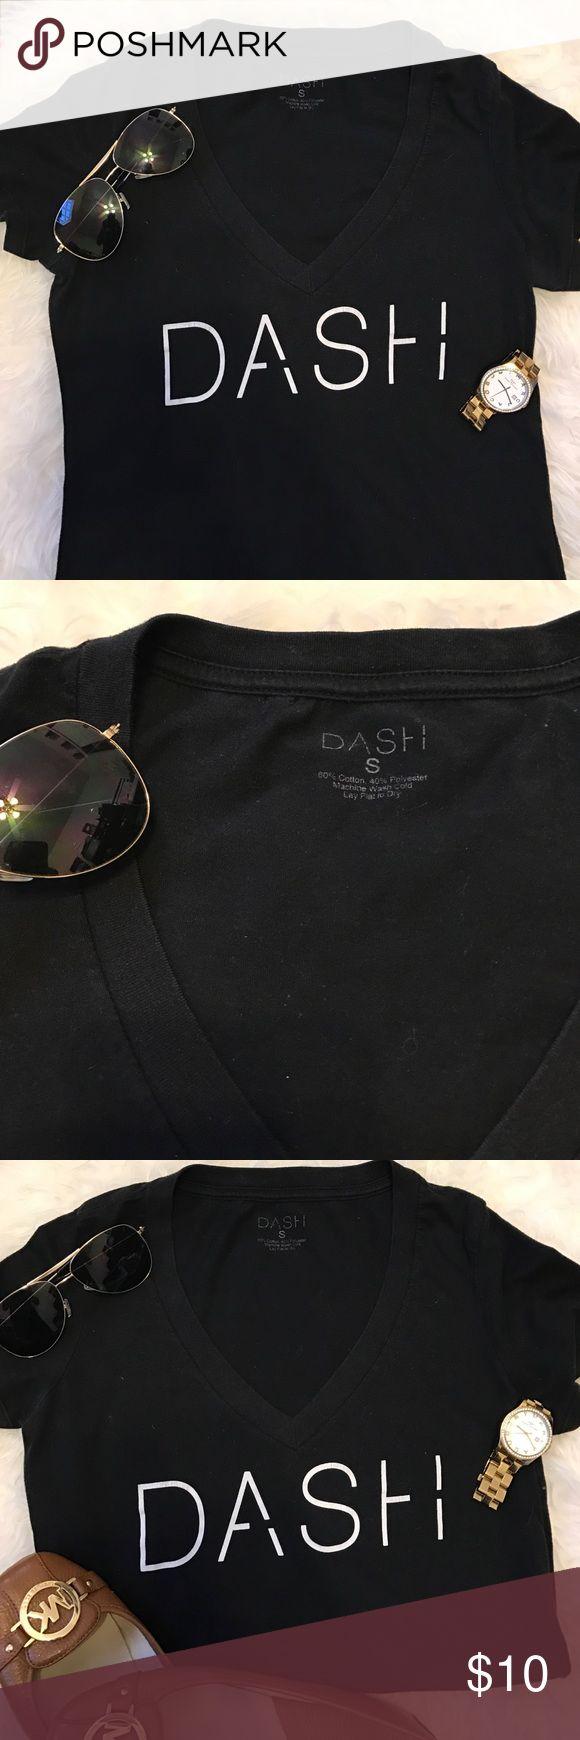 DASH t-shirt from the LA Kardashian store. Size Small DASH t-Shirt, from the LA Kardashian boutique. I like new condition. Kardashian Kollection Tops Tees - Short Sleeve